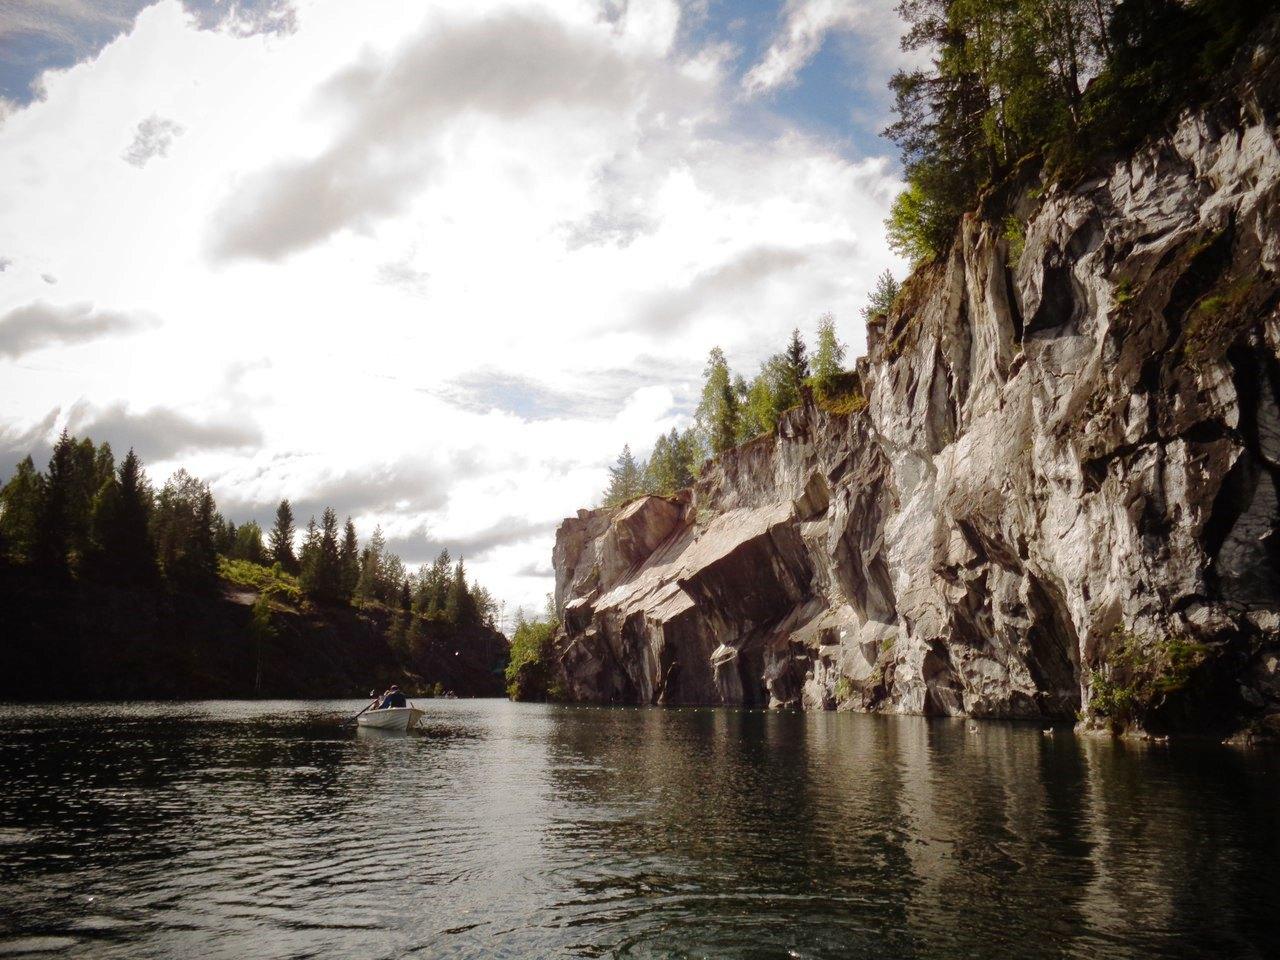 Три карельских мудреца: лес, вода и камень